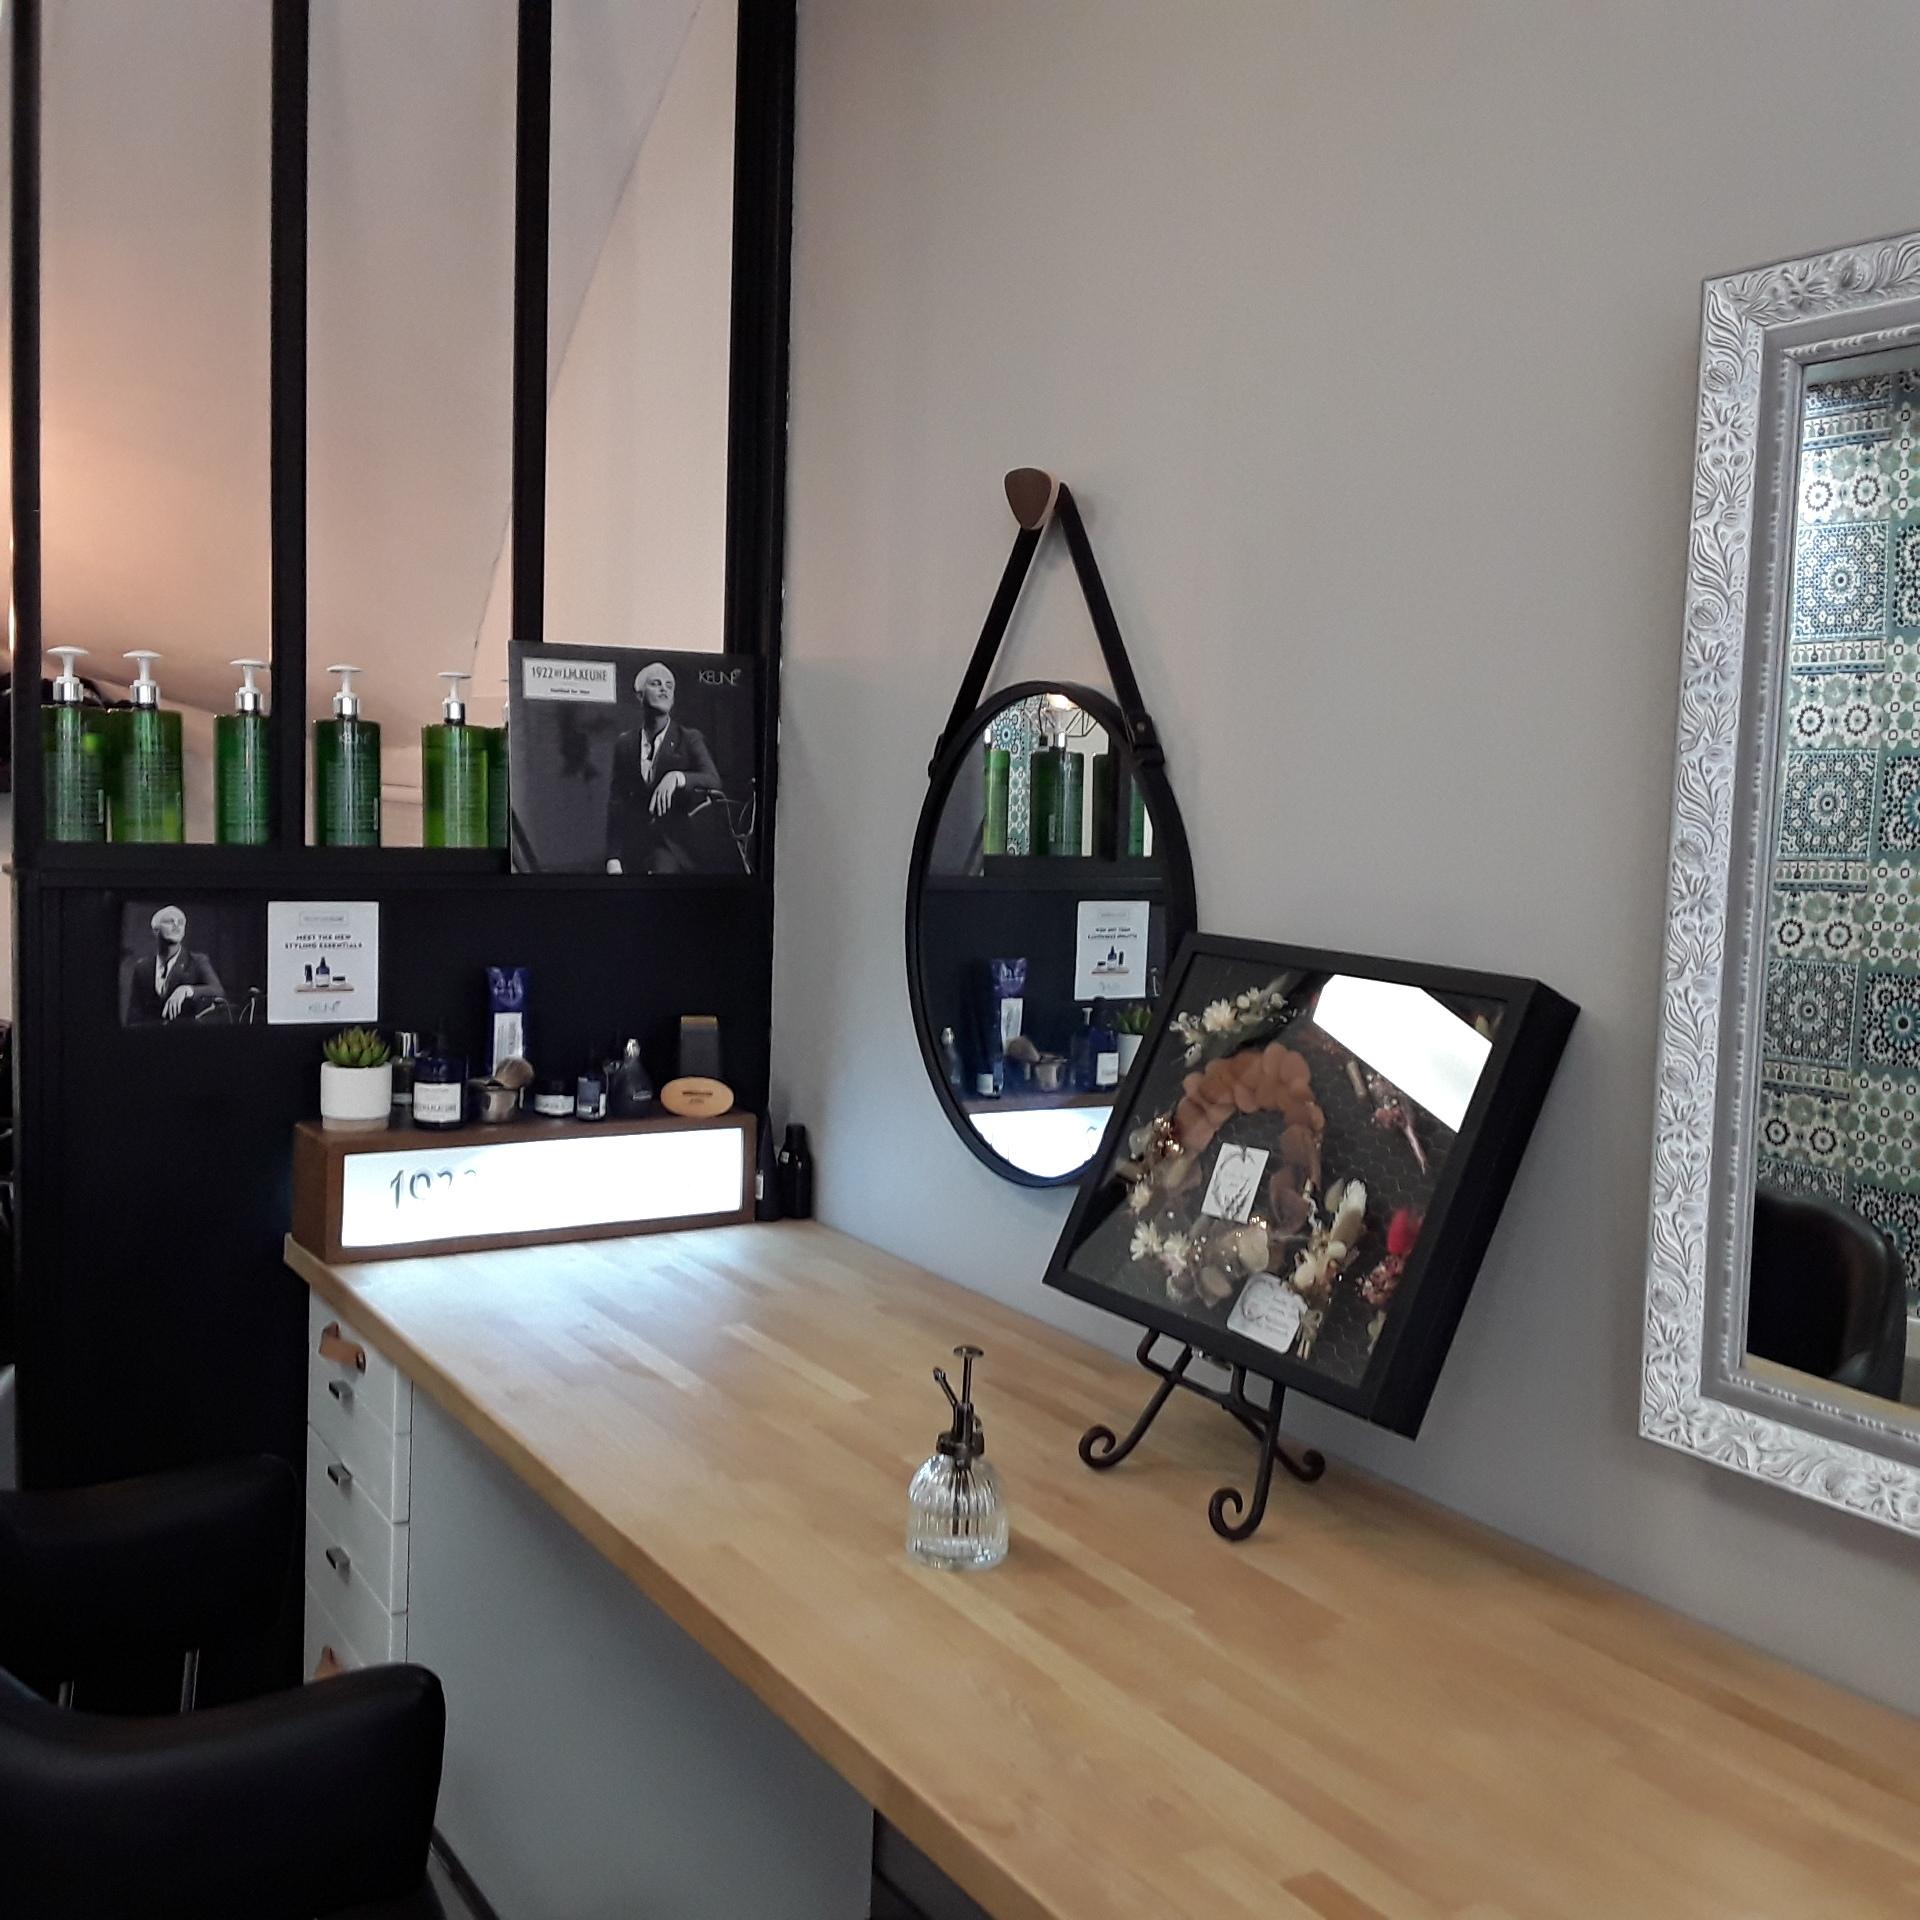 Galerie d'image - Fougehair